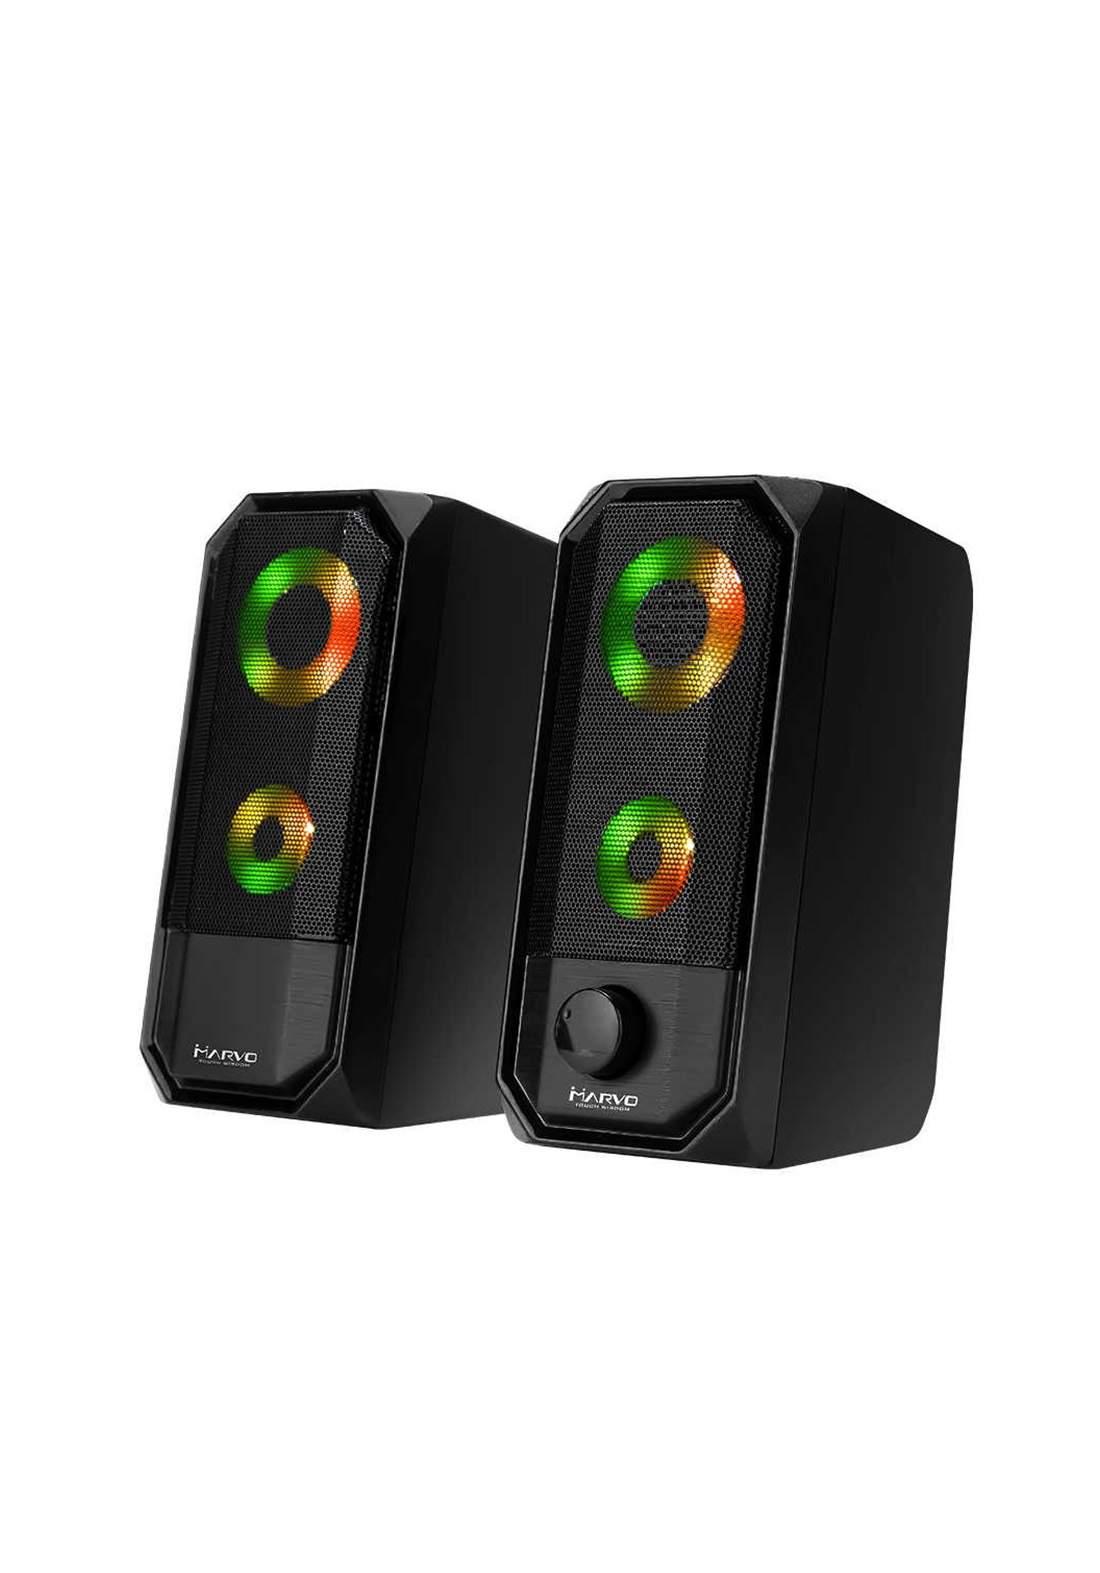 Marvo Scorpion SG-265 RGB LED Stereo Gaming Speakers